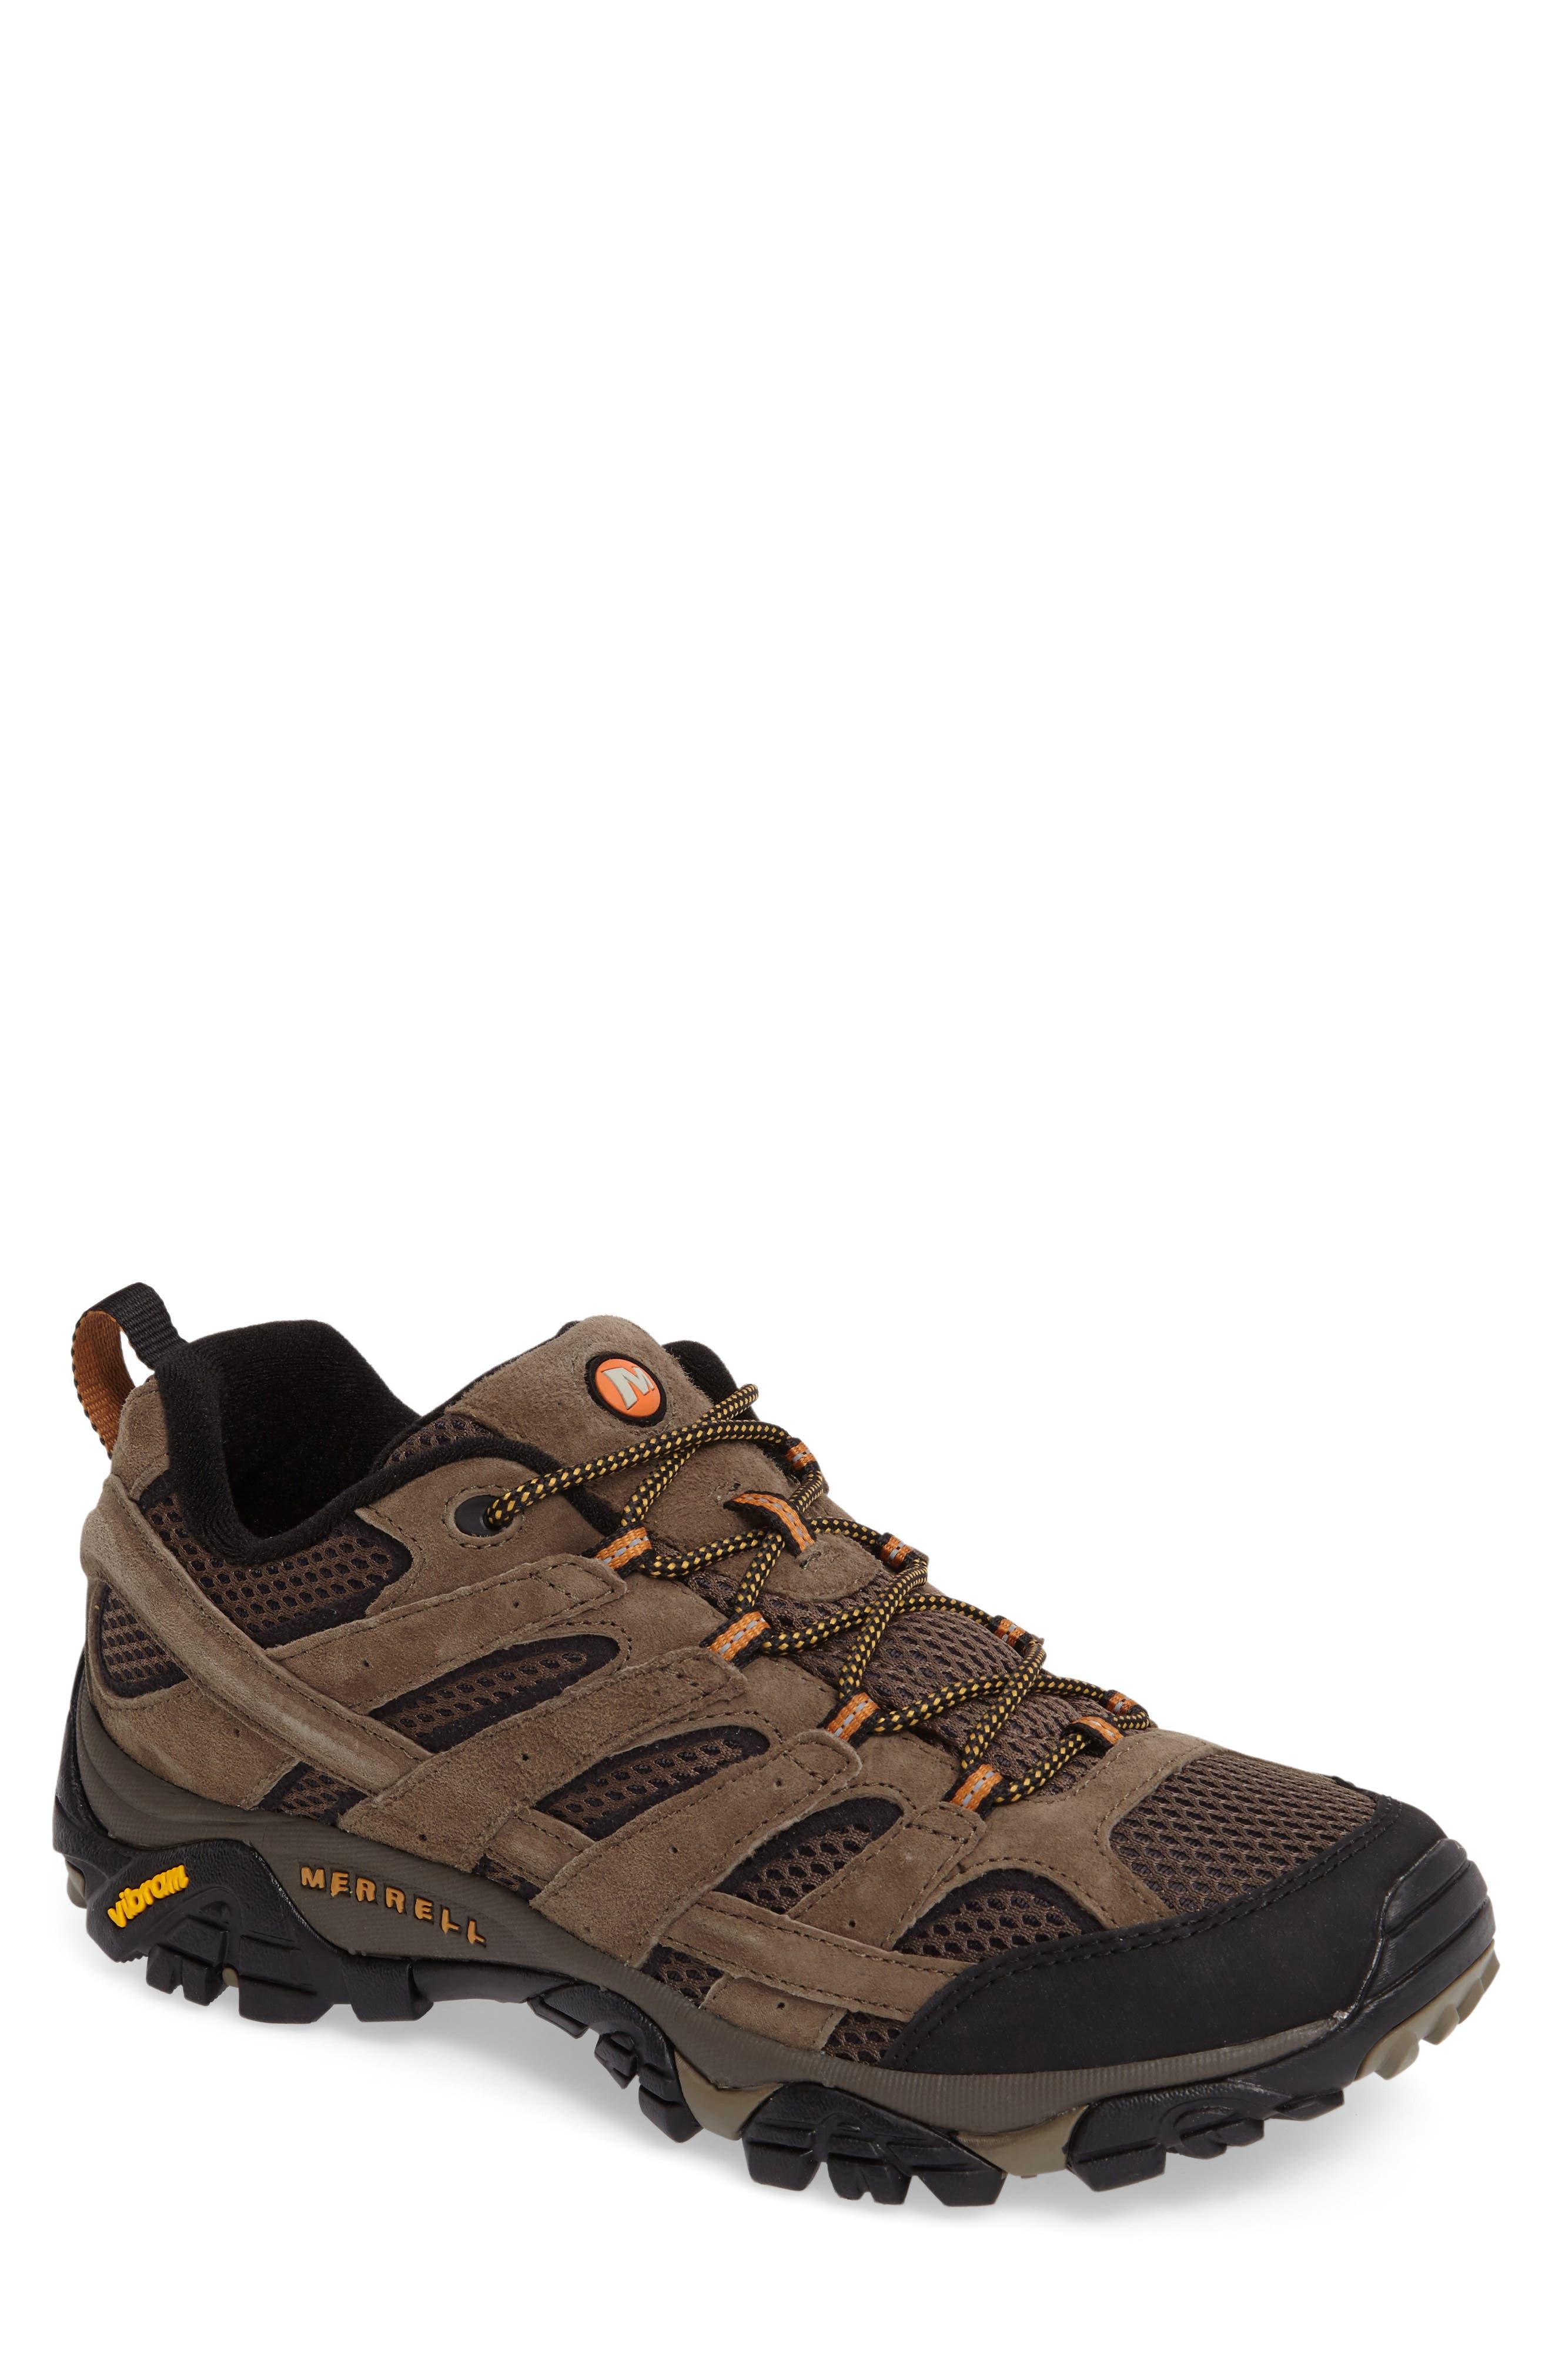 Moab 2 Ventilator Hiking Shoe